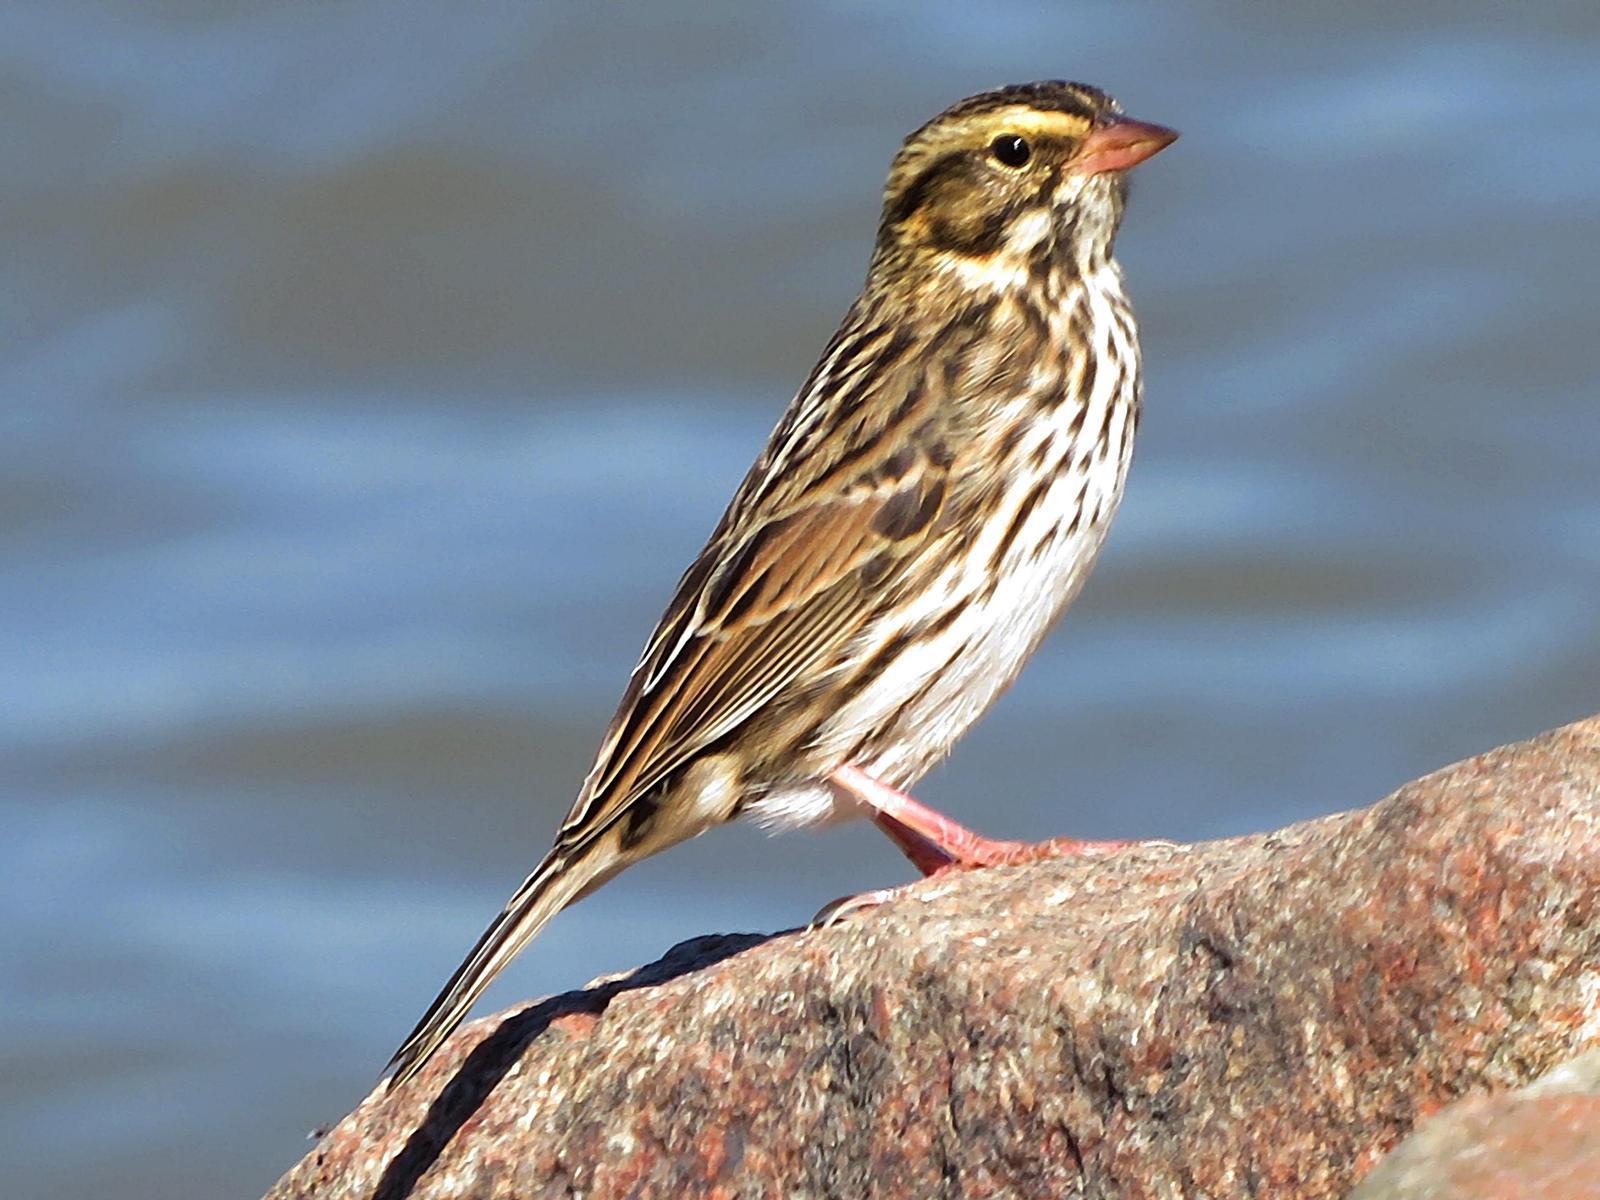 Savannah Sparrow Photo by Bob Neugebauer